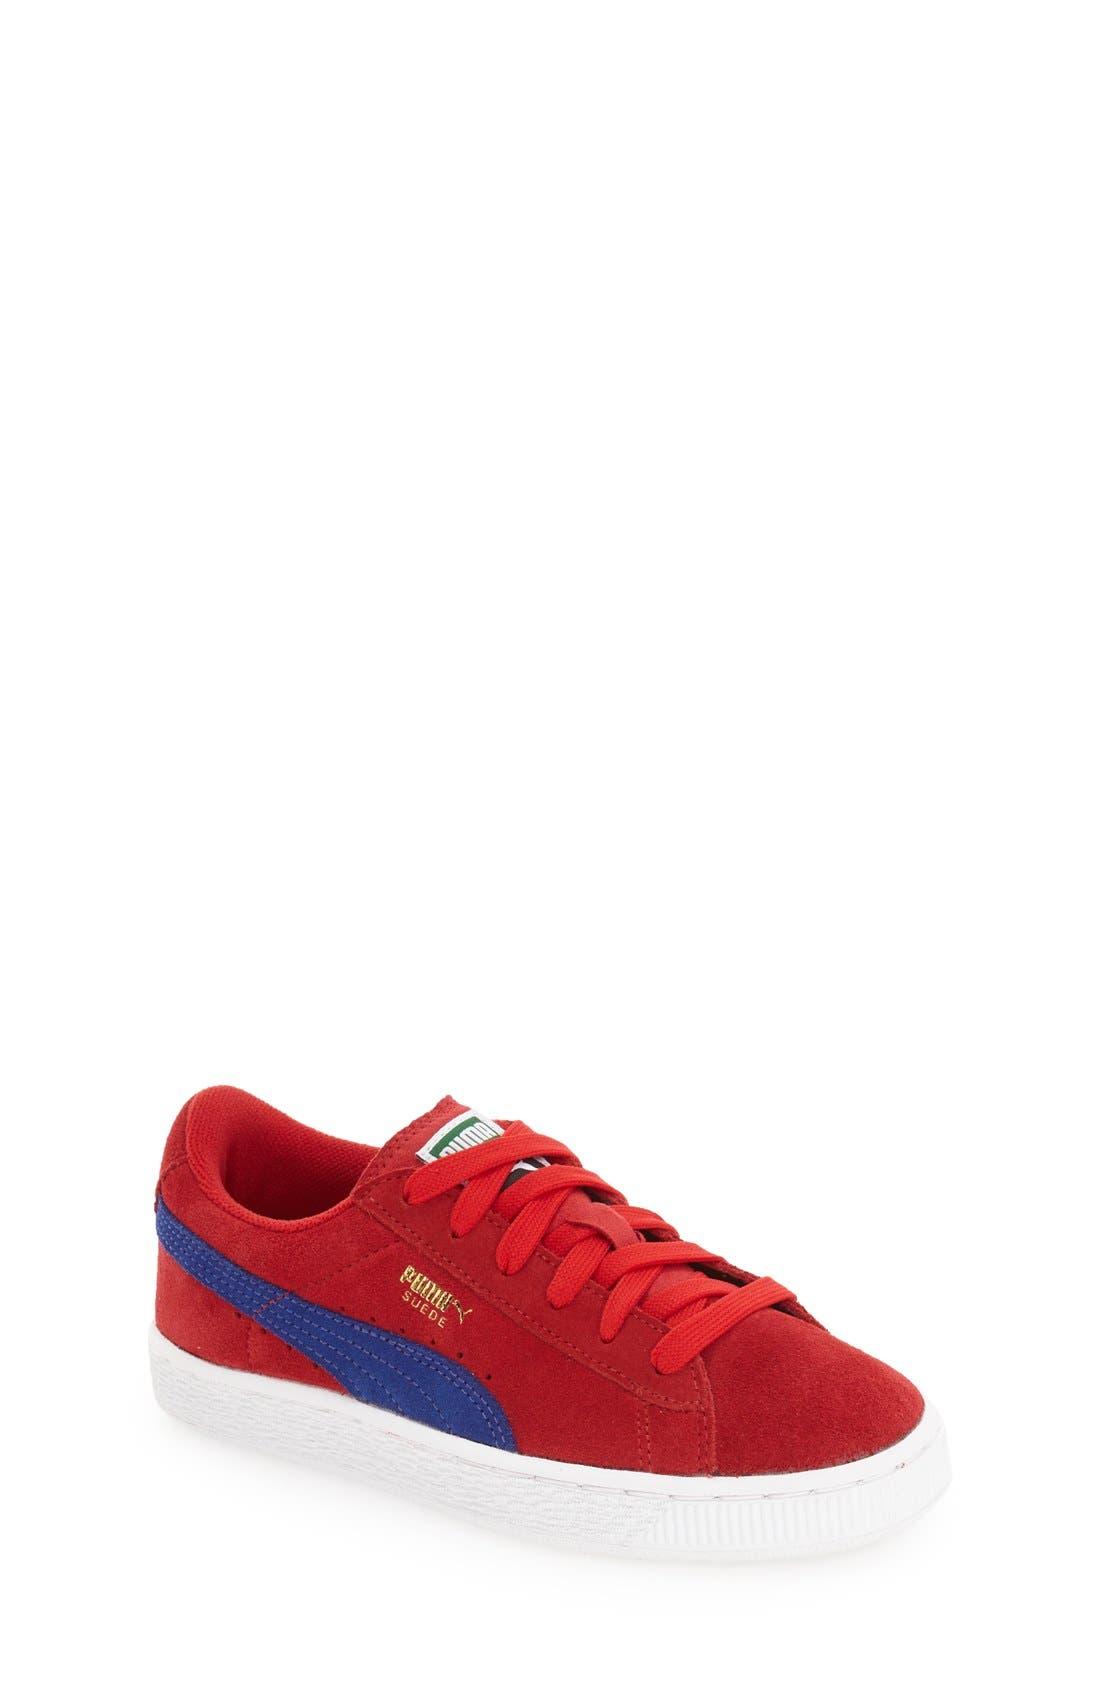 PUMA Suede Sneaker (Toddler, Little Kid & Big Kid)